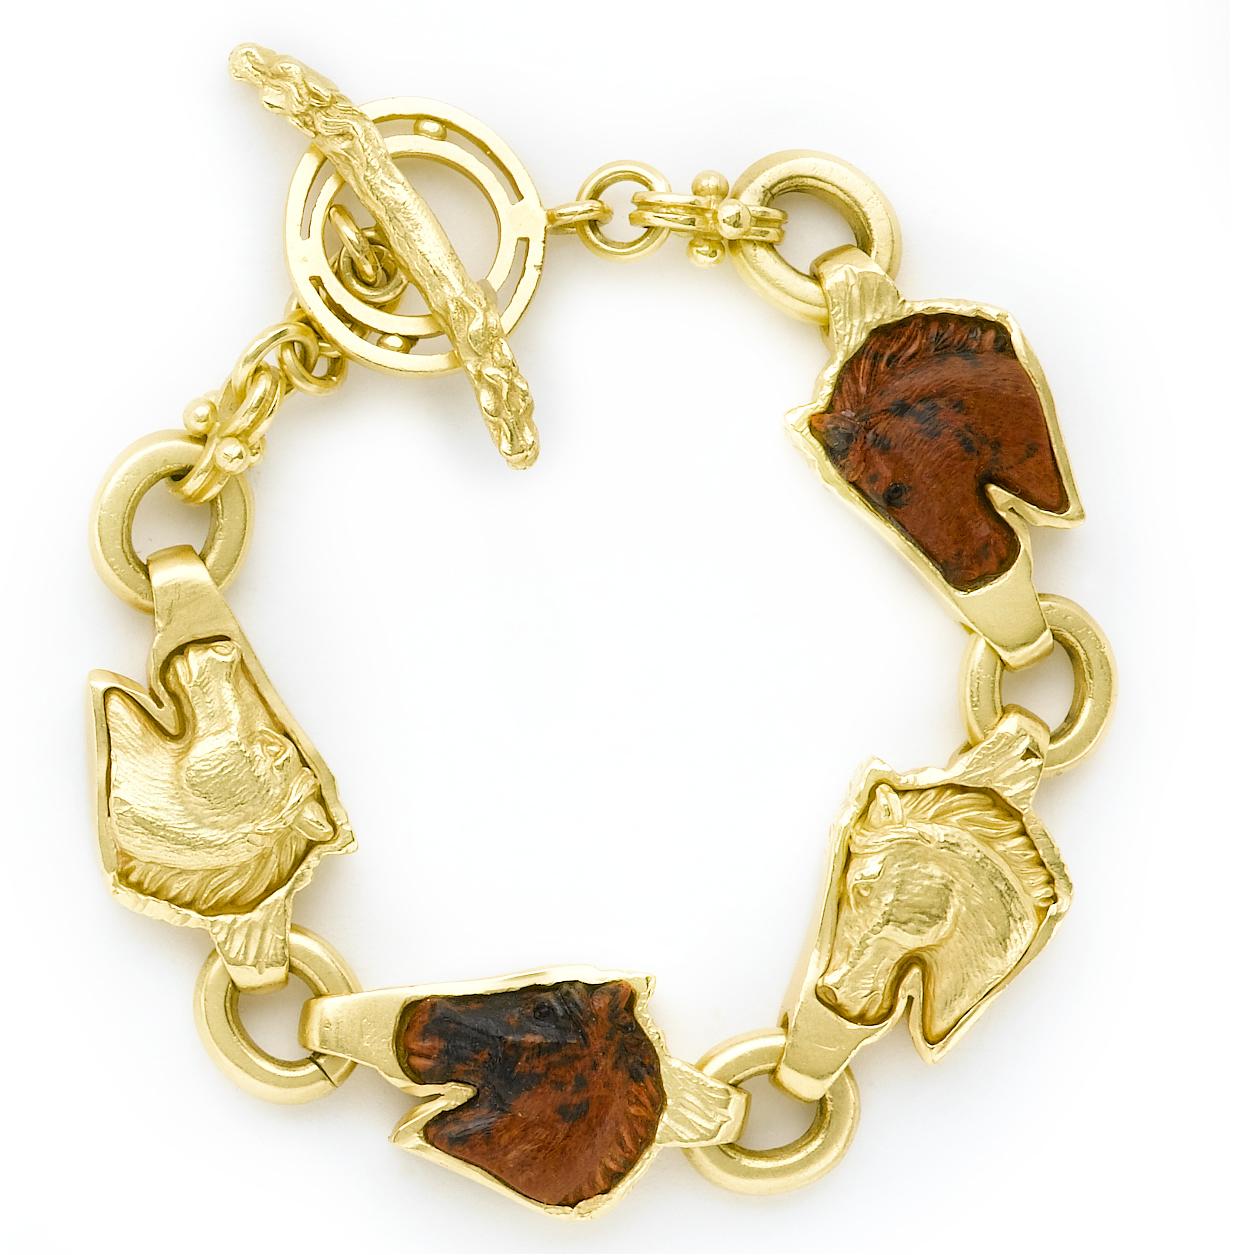 Gold Bracelet with Horses